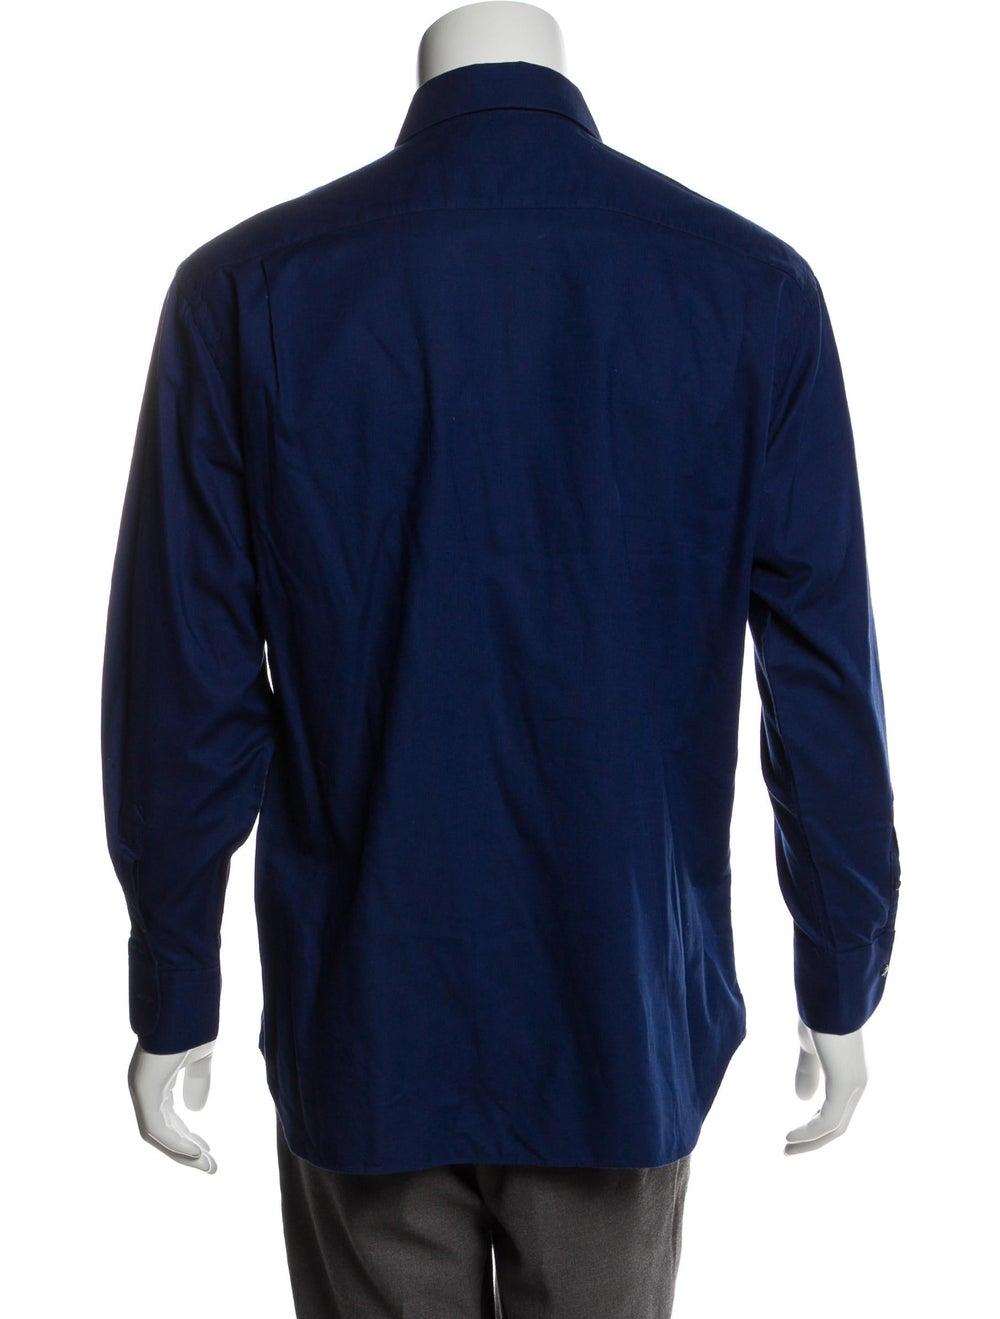 Prada Woven Button-Up Shirt - image 3